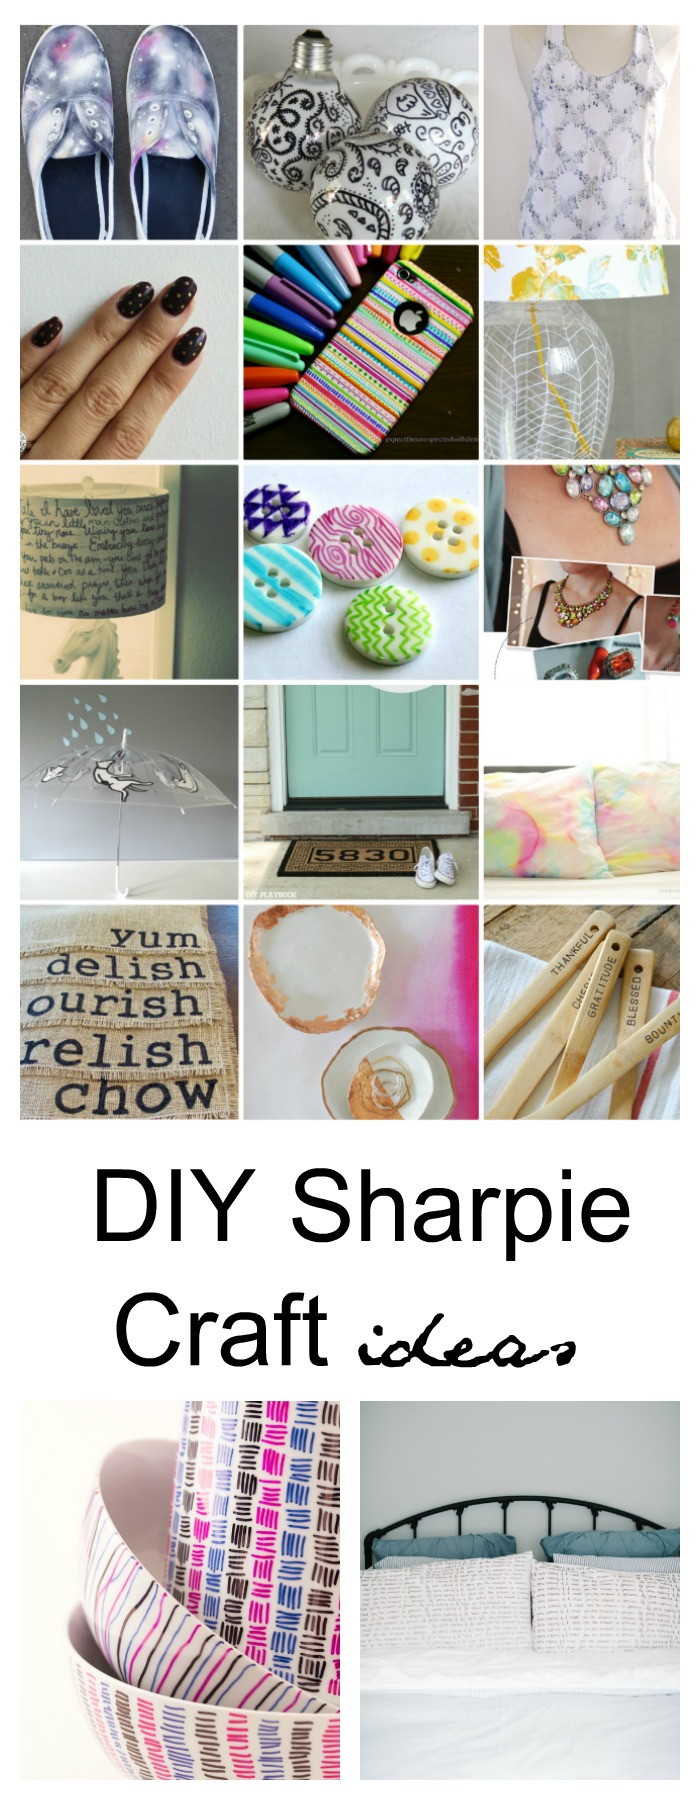 DIY-Sharpie-Craft-Ideas-Pin